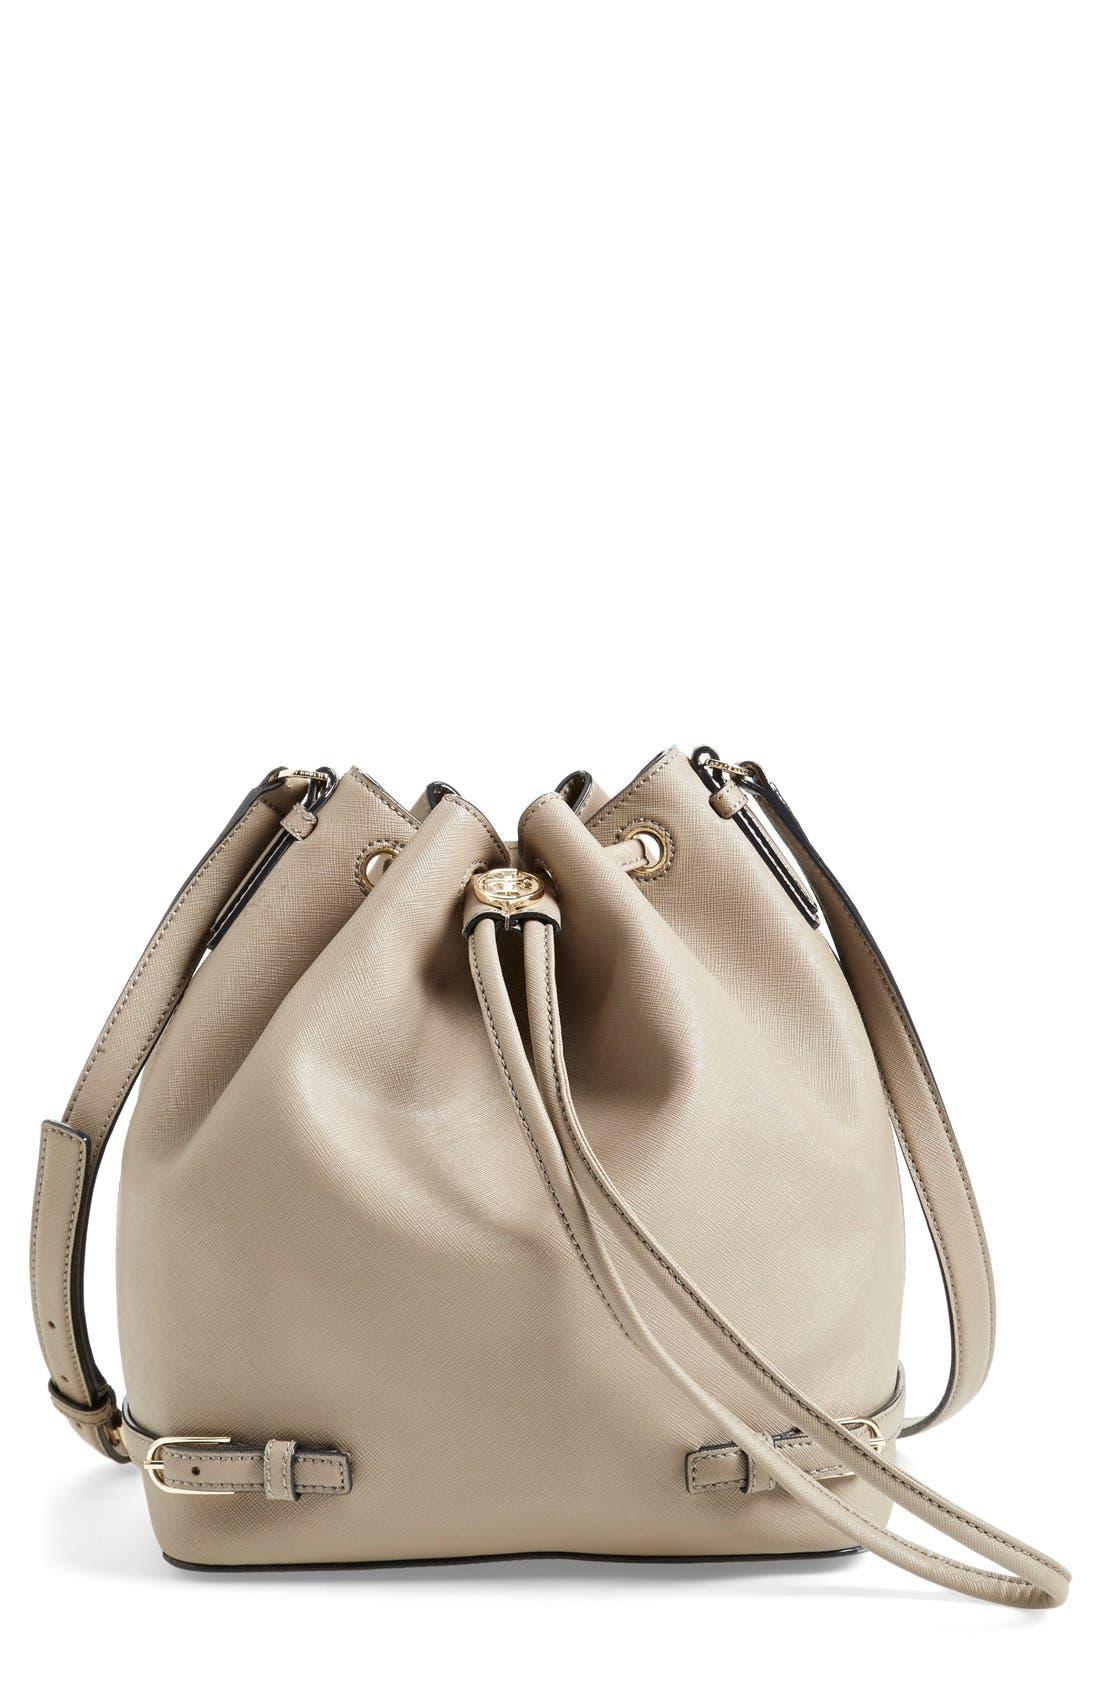 Main Image - Tory Burch 'Robinson' Saffiano Leather Bucket Bag